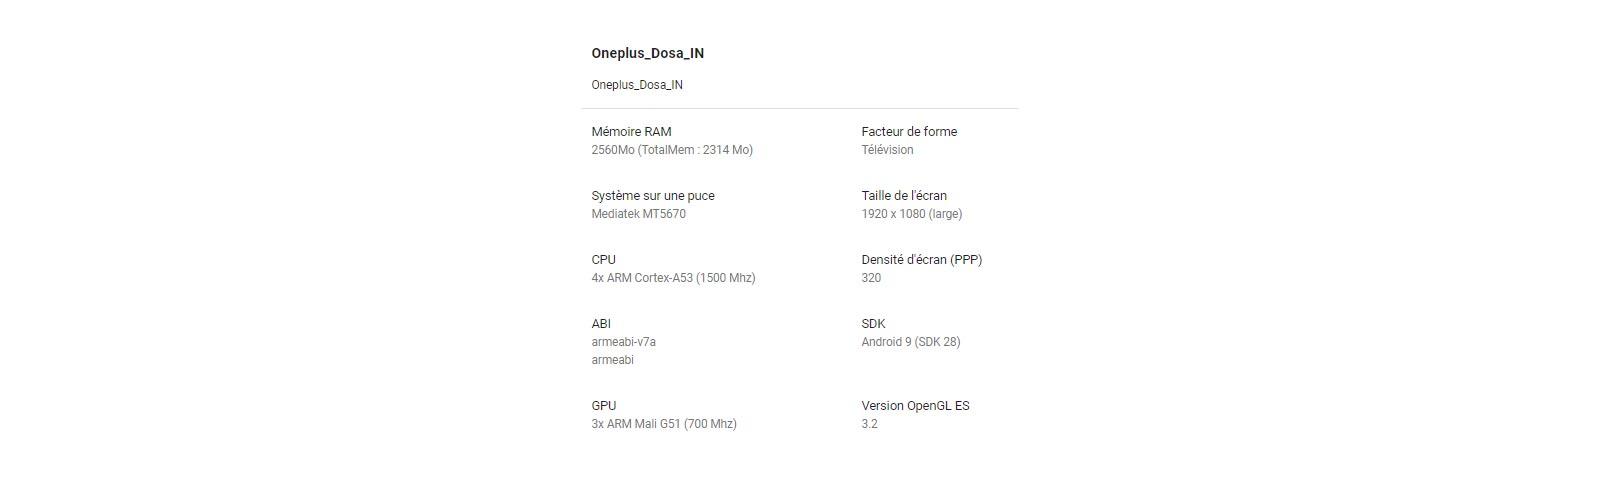 "OnePlus TV rumoured specifications - 4K UHD, 55"", Mediatek MT5670 SoC, 3GB RAM"